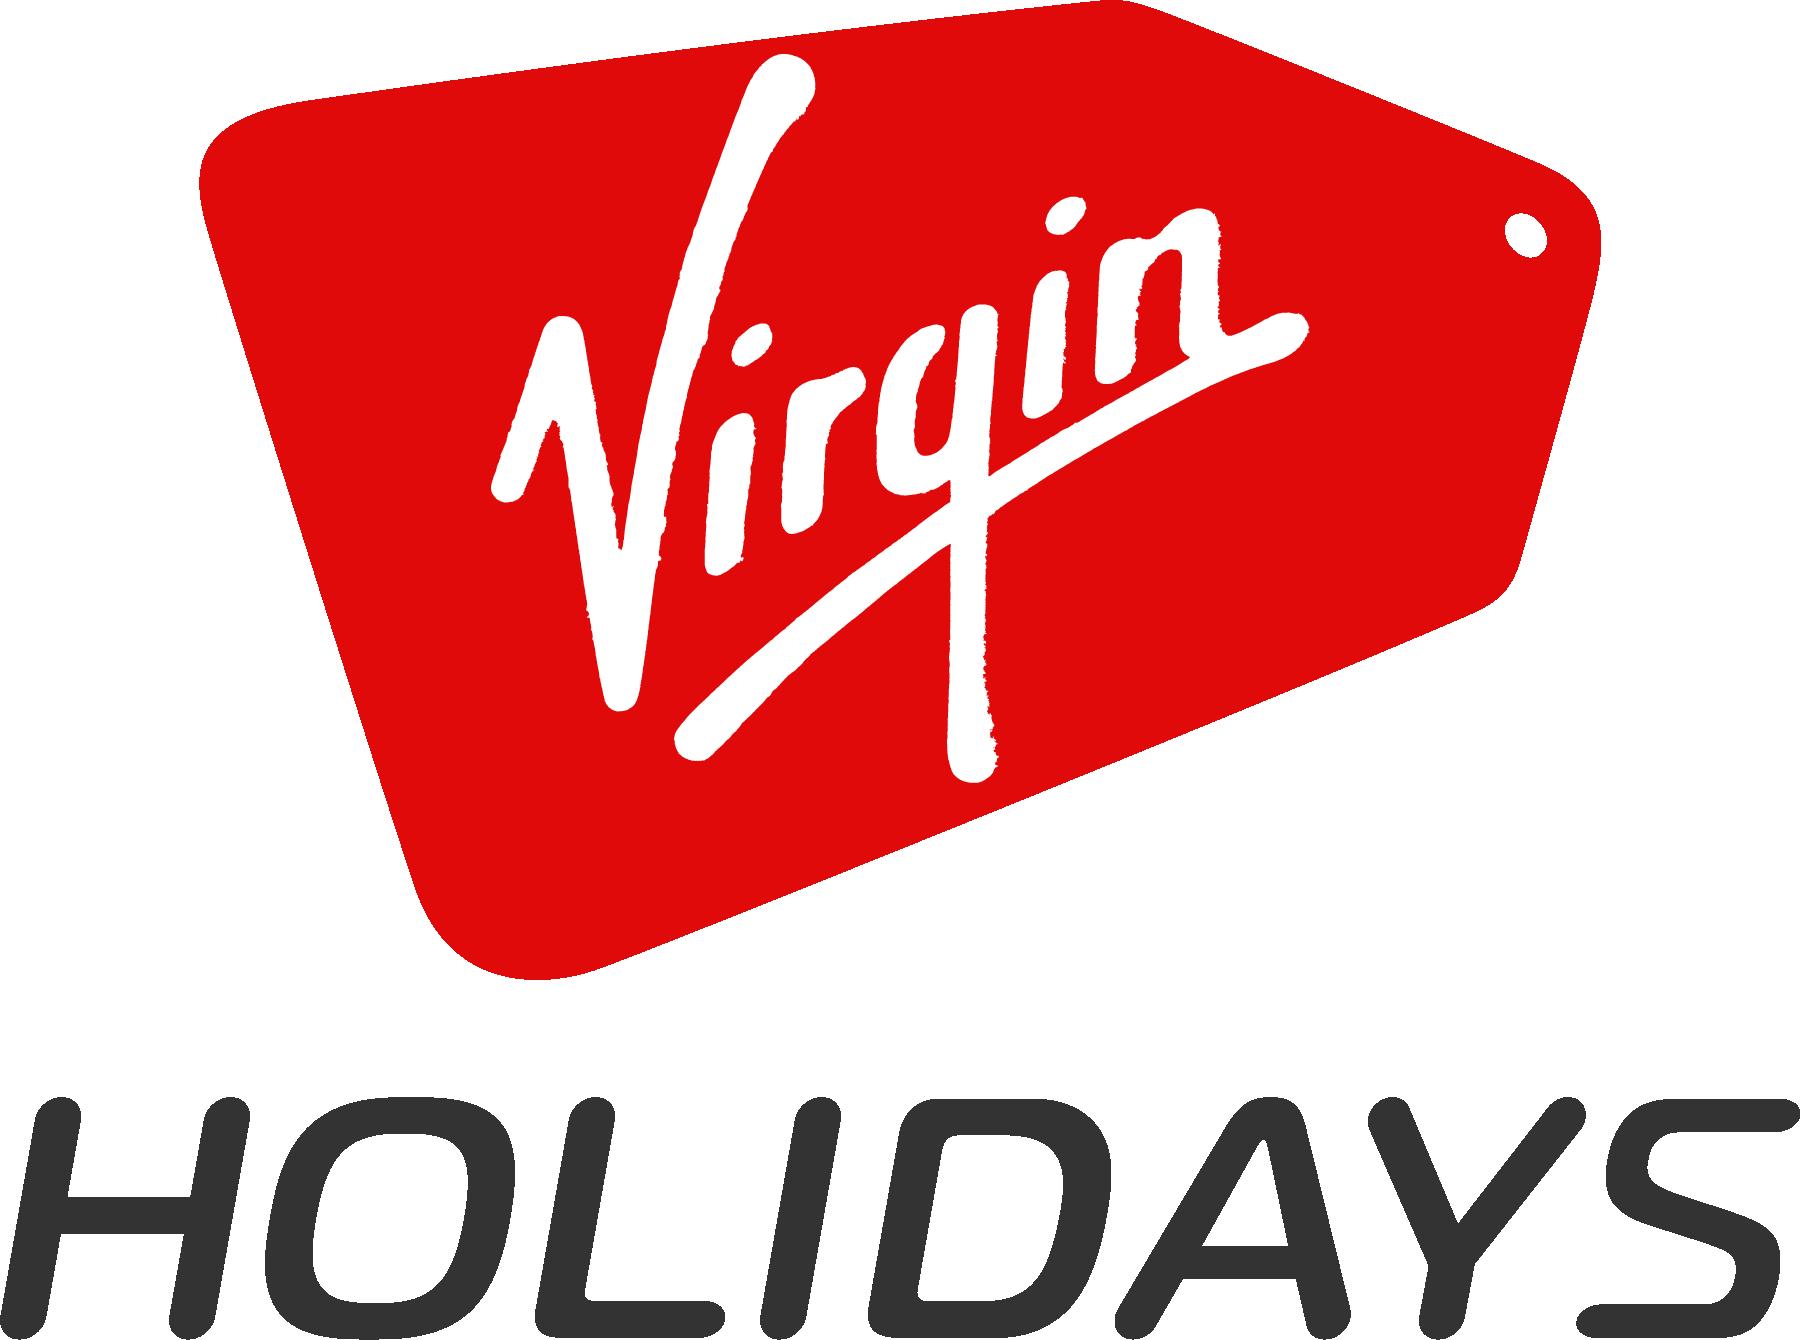 Virgin Holidays at Tesco, Aylesbury